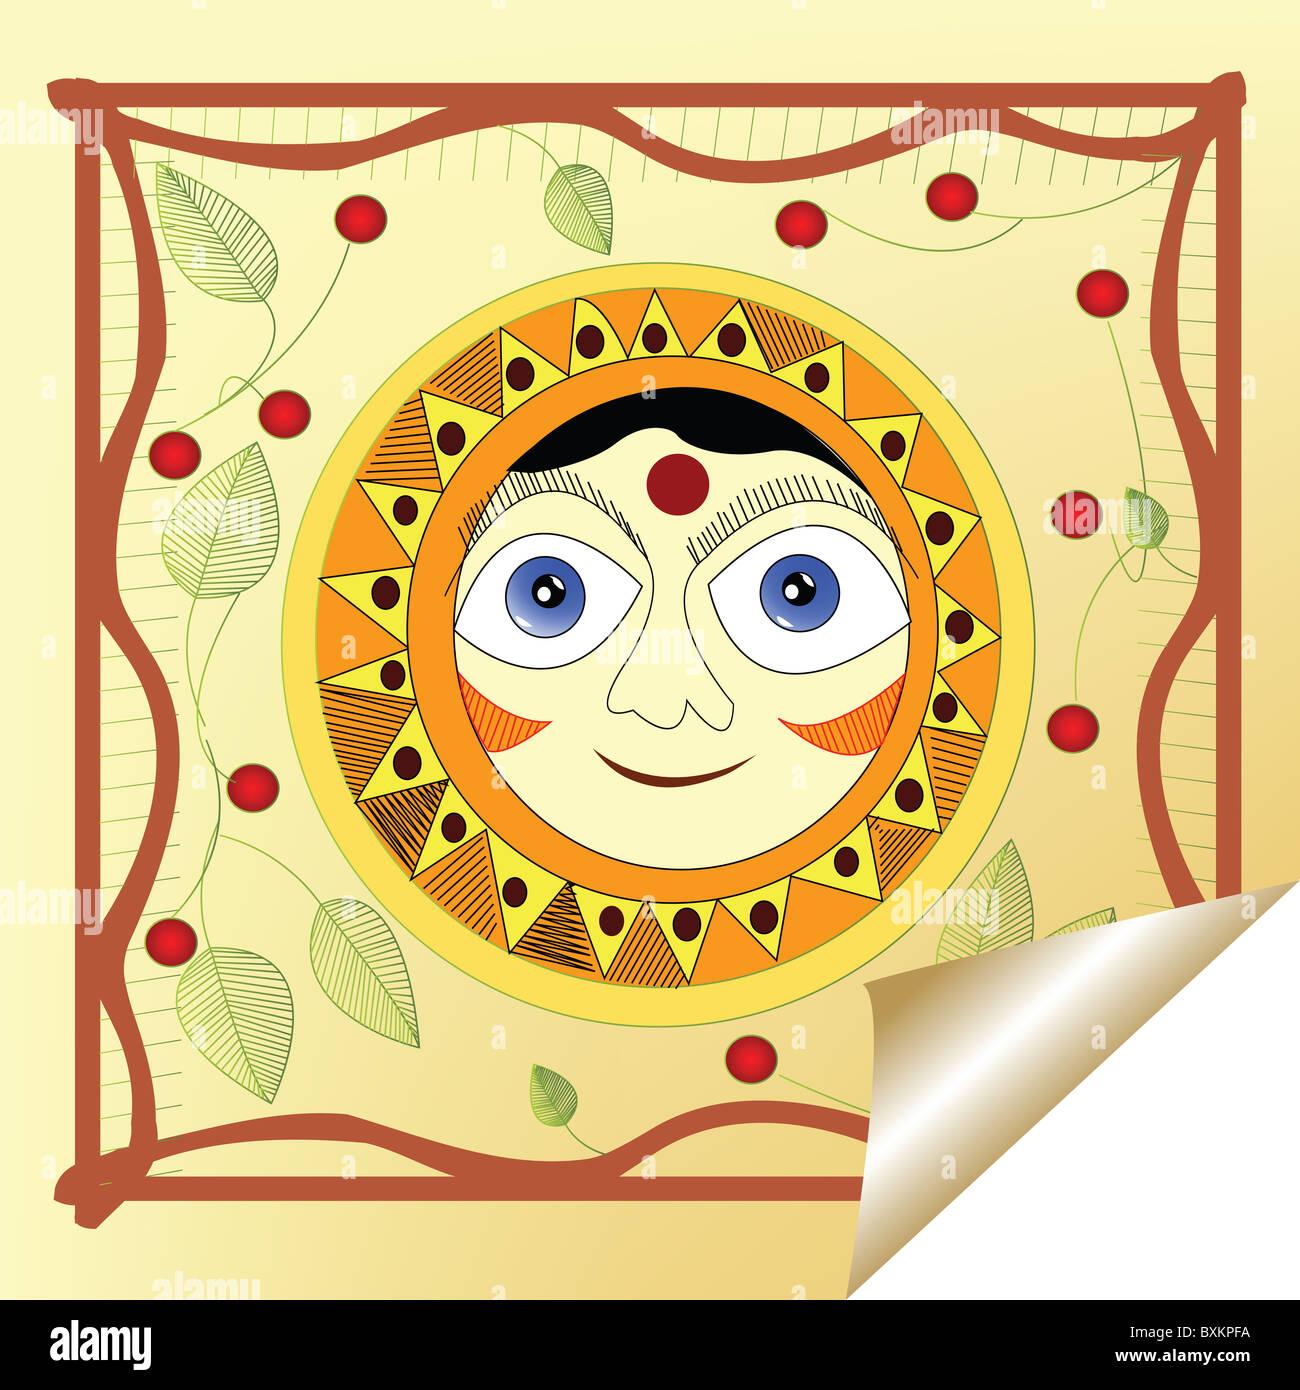 smiling sun - Stock Image